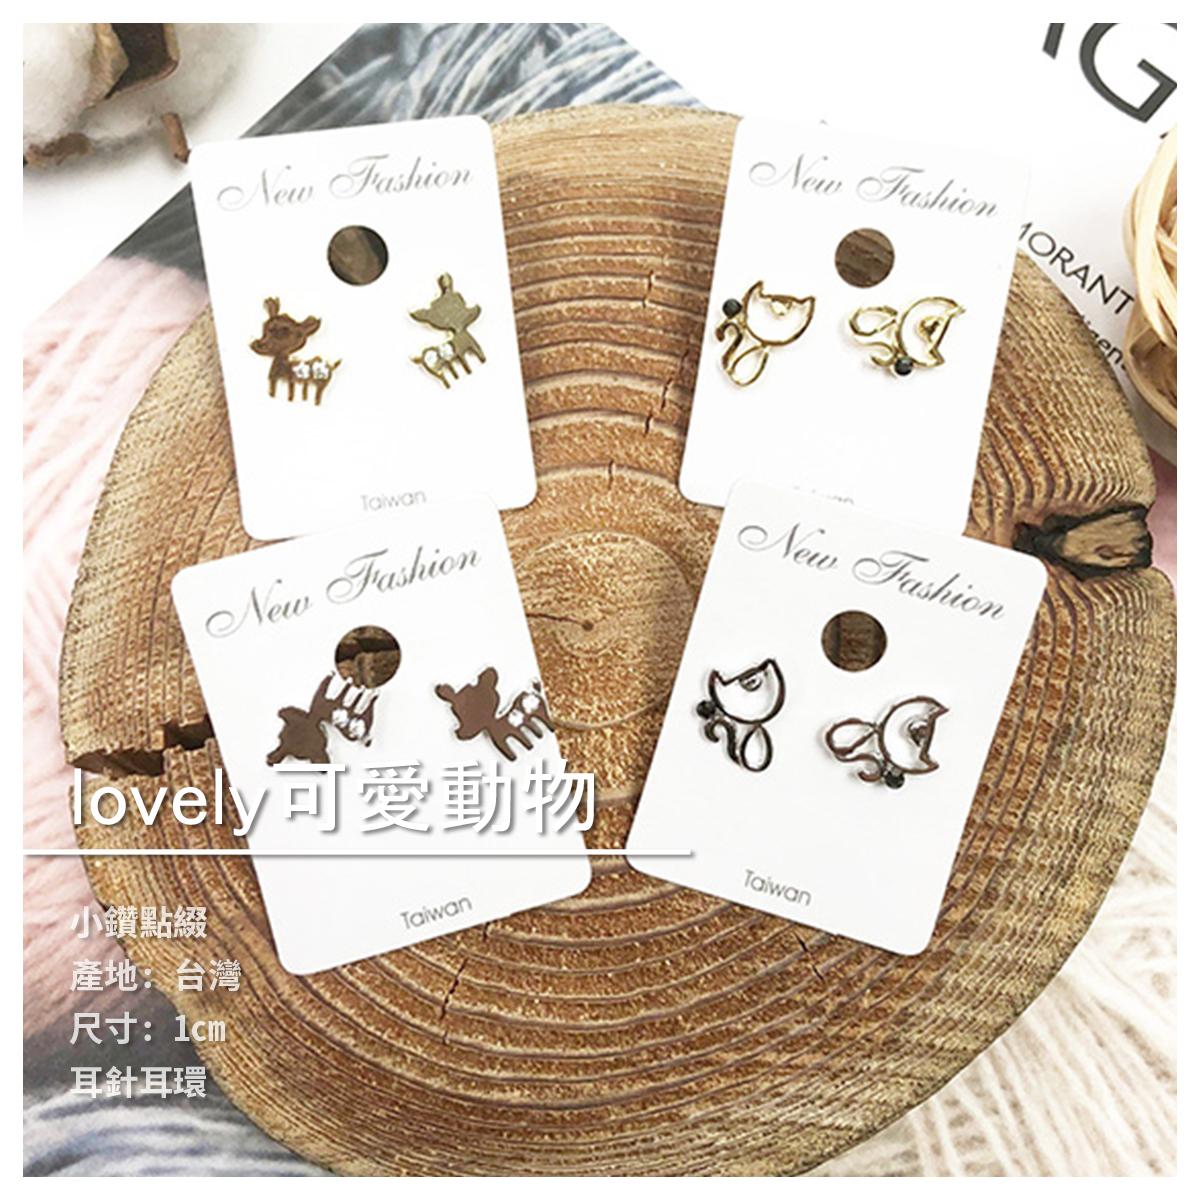 【JG飾品】lovely可愛動物 耳針耳環 4款